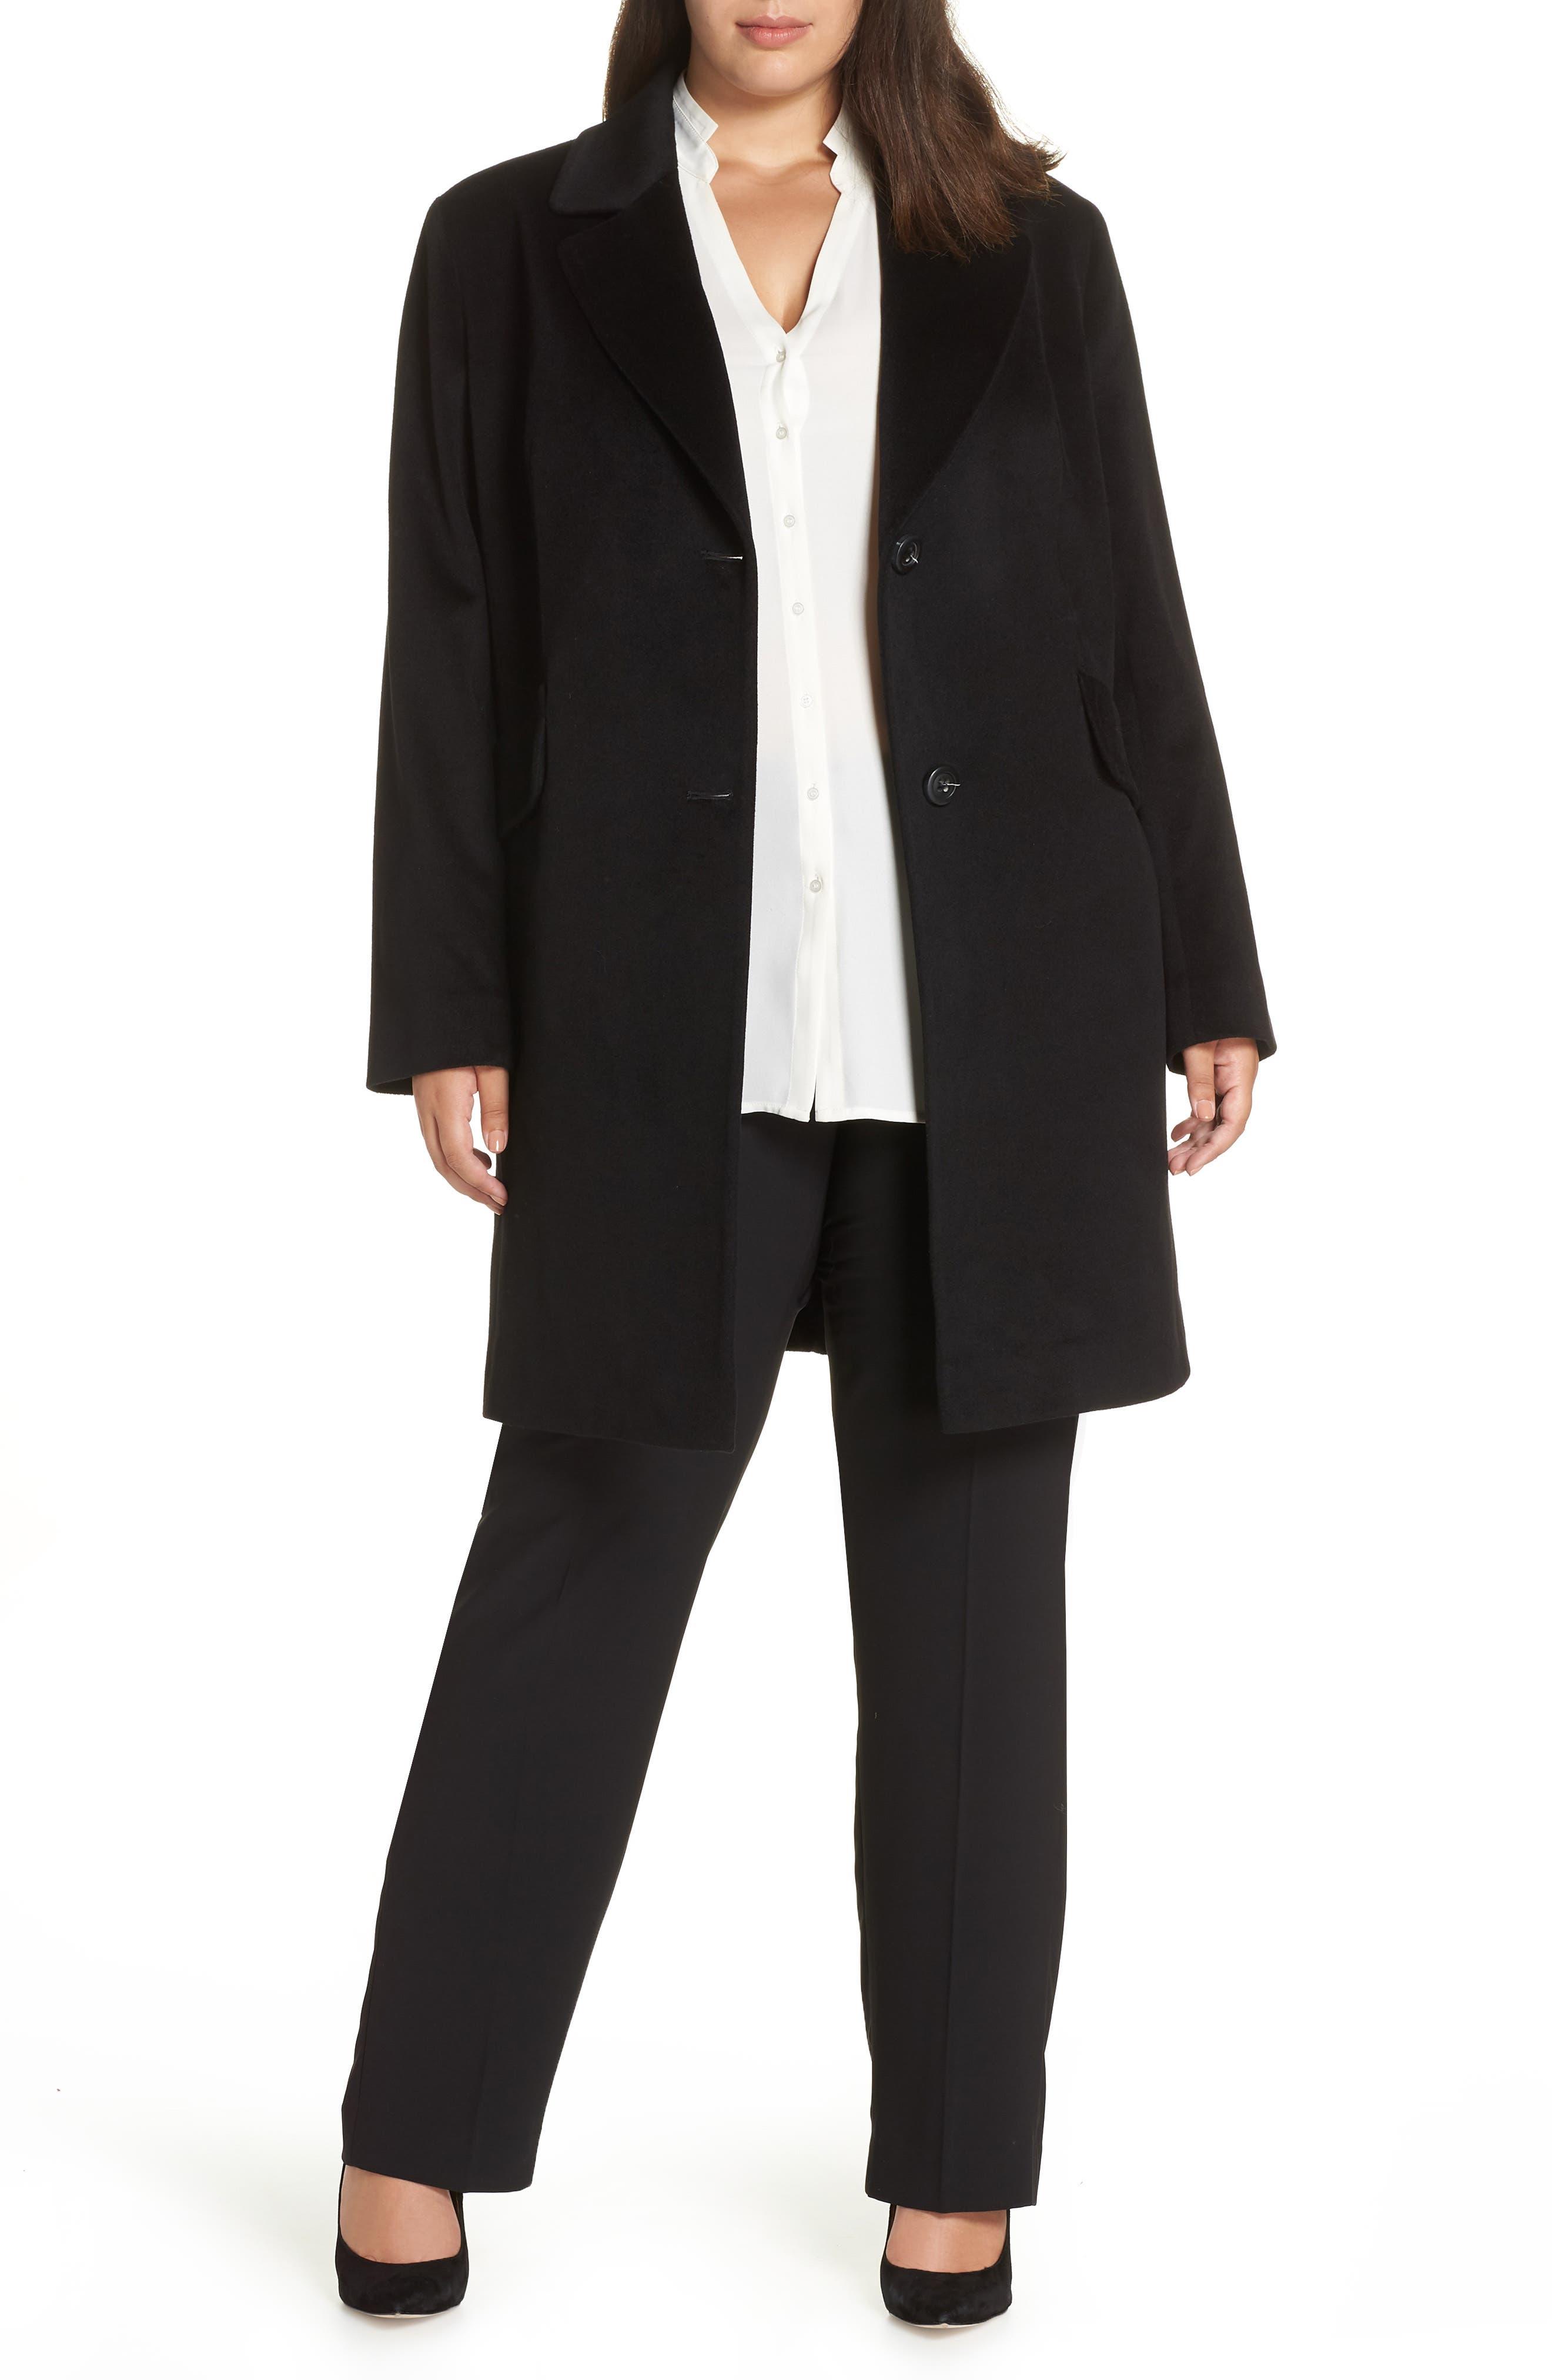 FLEURETTE, Notch Collar Loro Piana Wool Coat, Main thumbnail 1, color, BLACK